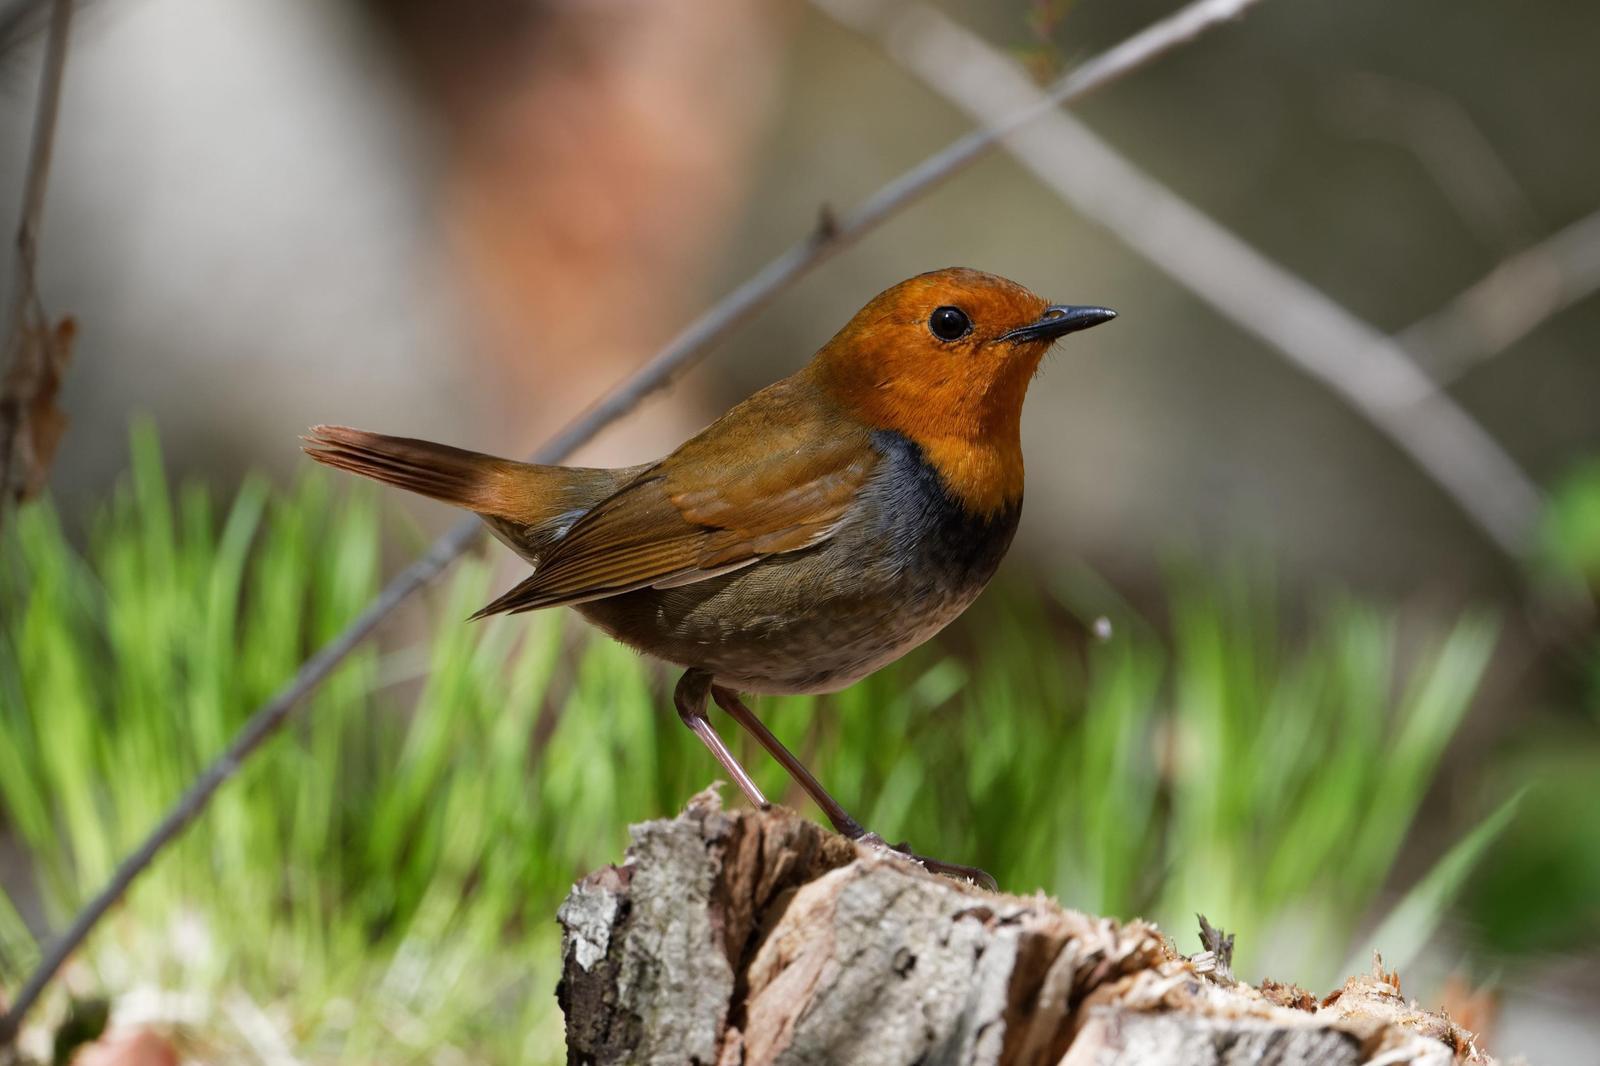 Japanese Robin Photo by Robert Cousins